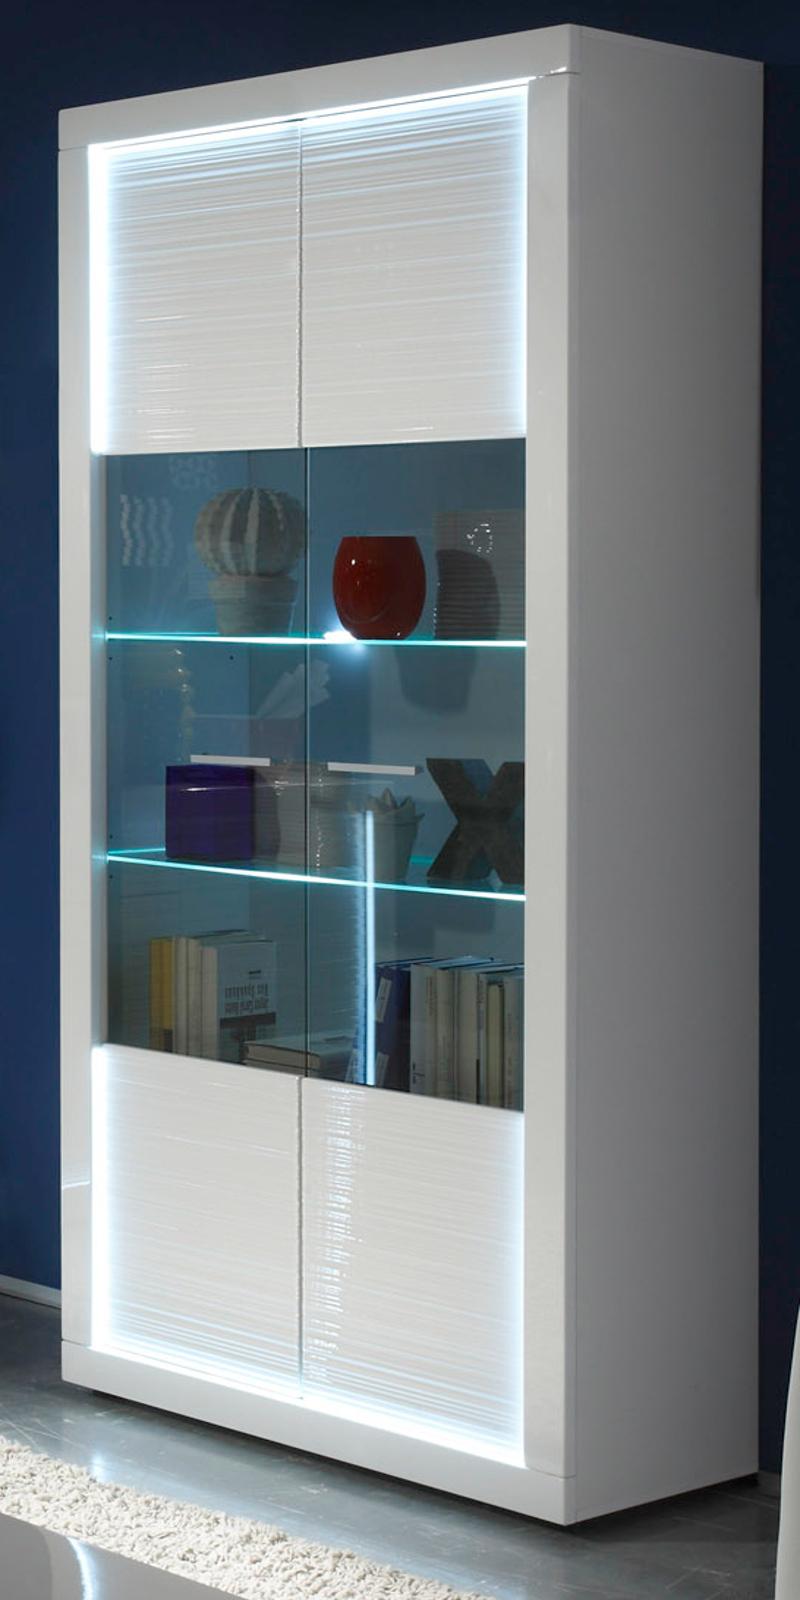 starlight beleuchtung led dekoration bild idee. Black Bedroom Furniture Sets. Home Design Ideas